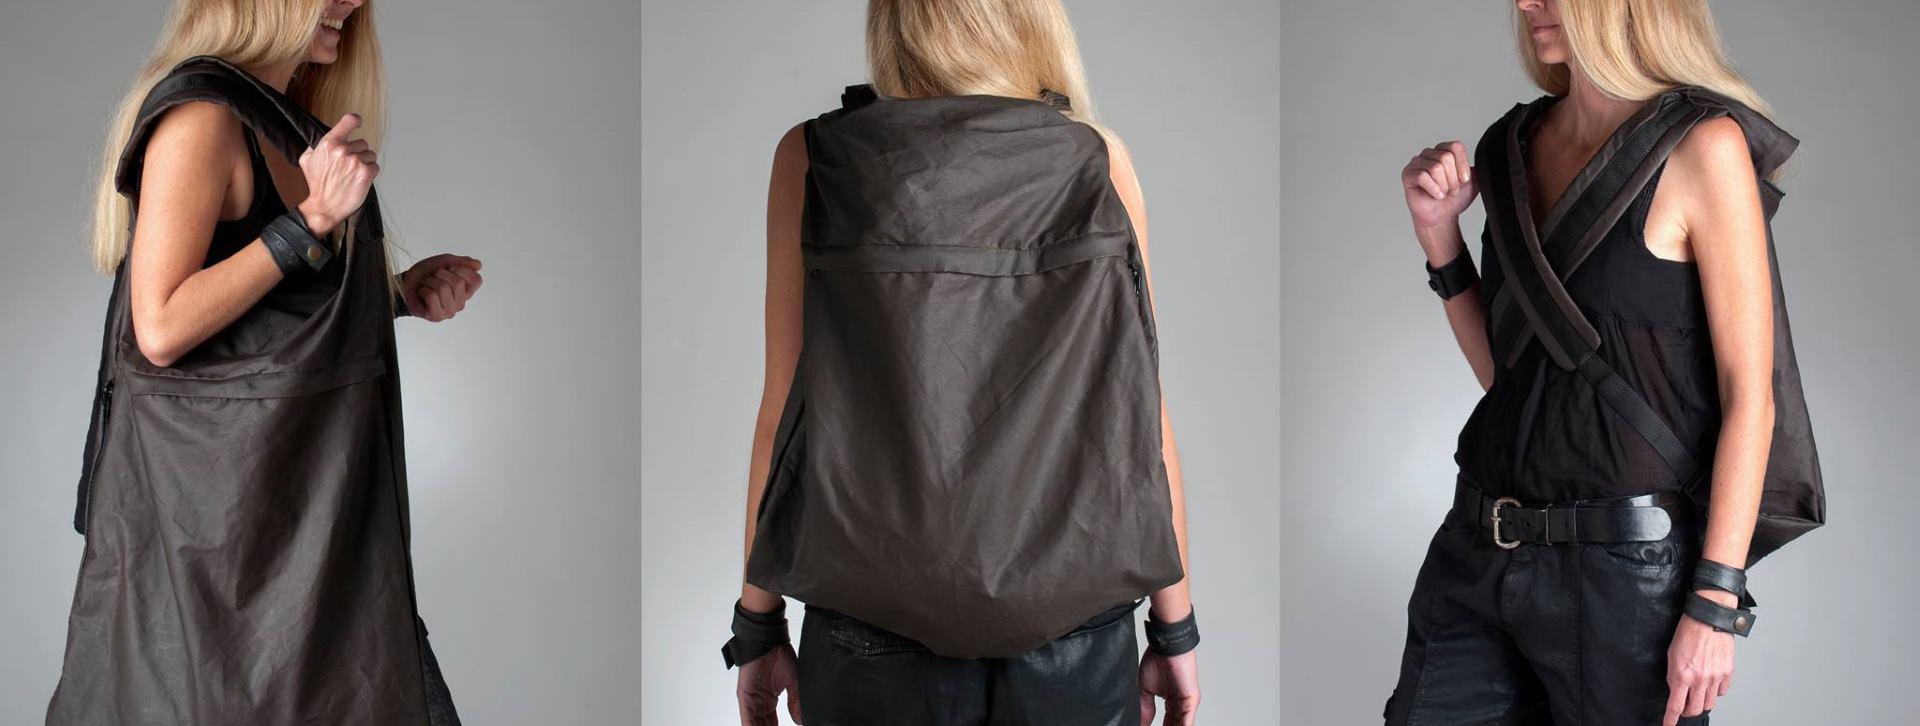 Vrećasta ruksak-torba idealna za kišno vrijeme